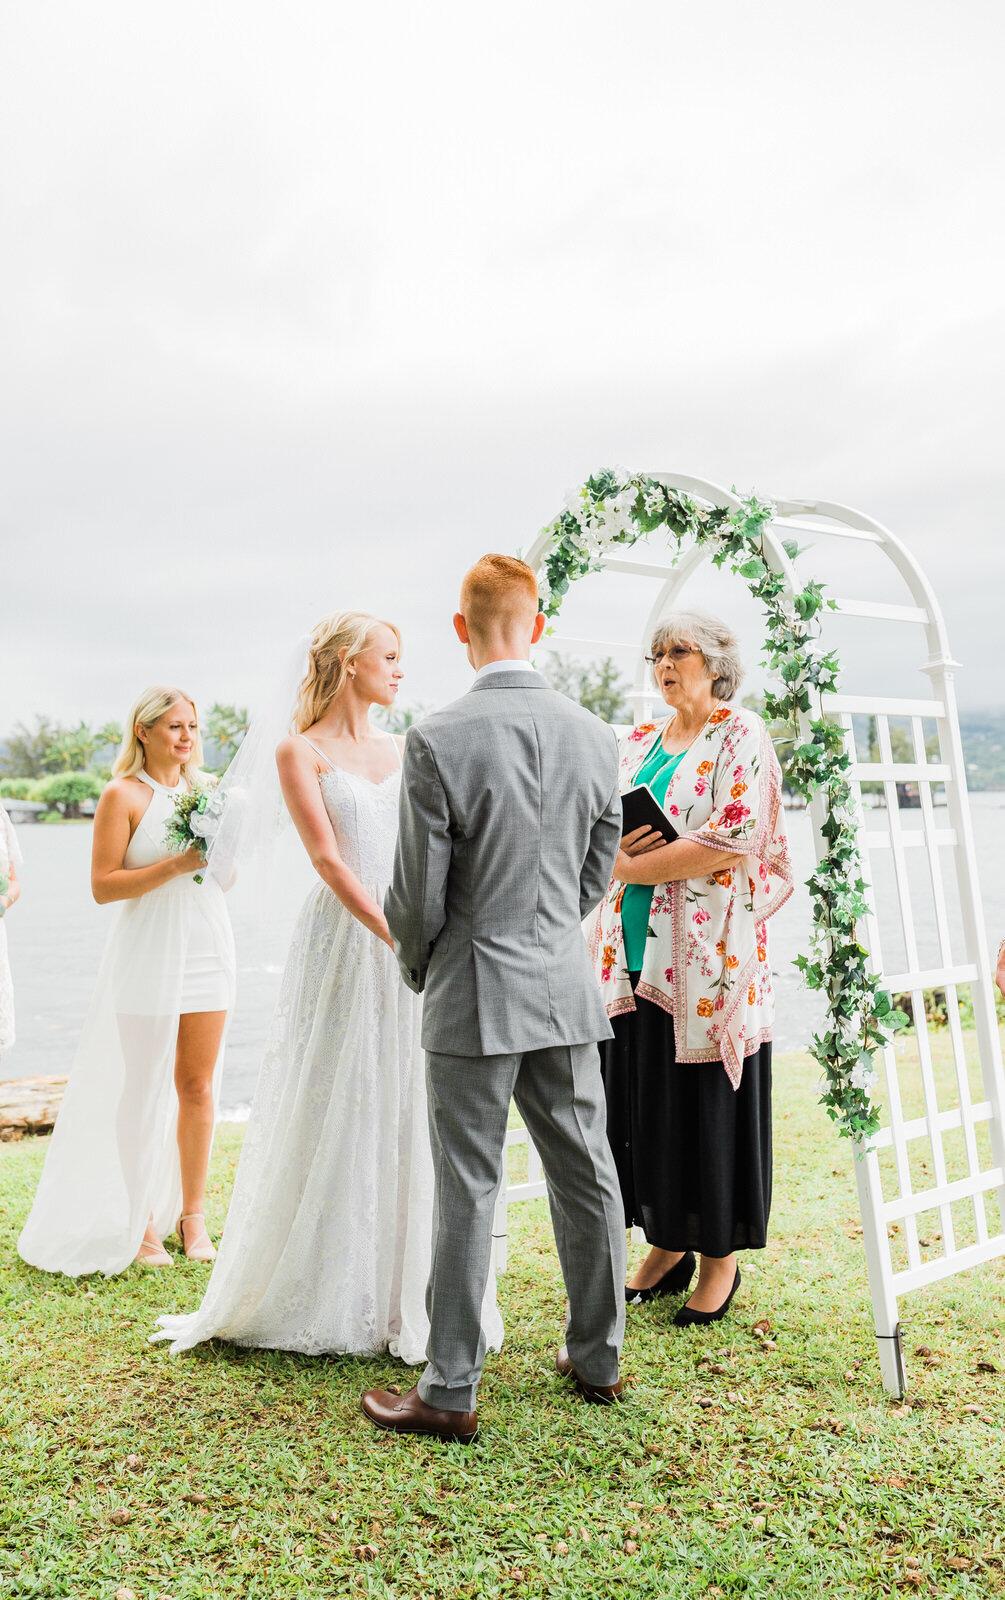 small-wedding-hawaii-destination-hilton-coconut-island-9690.jpg